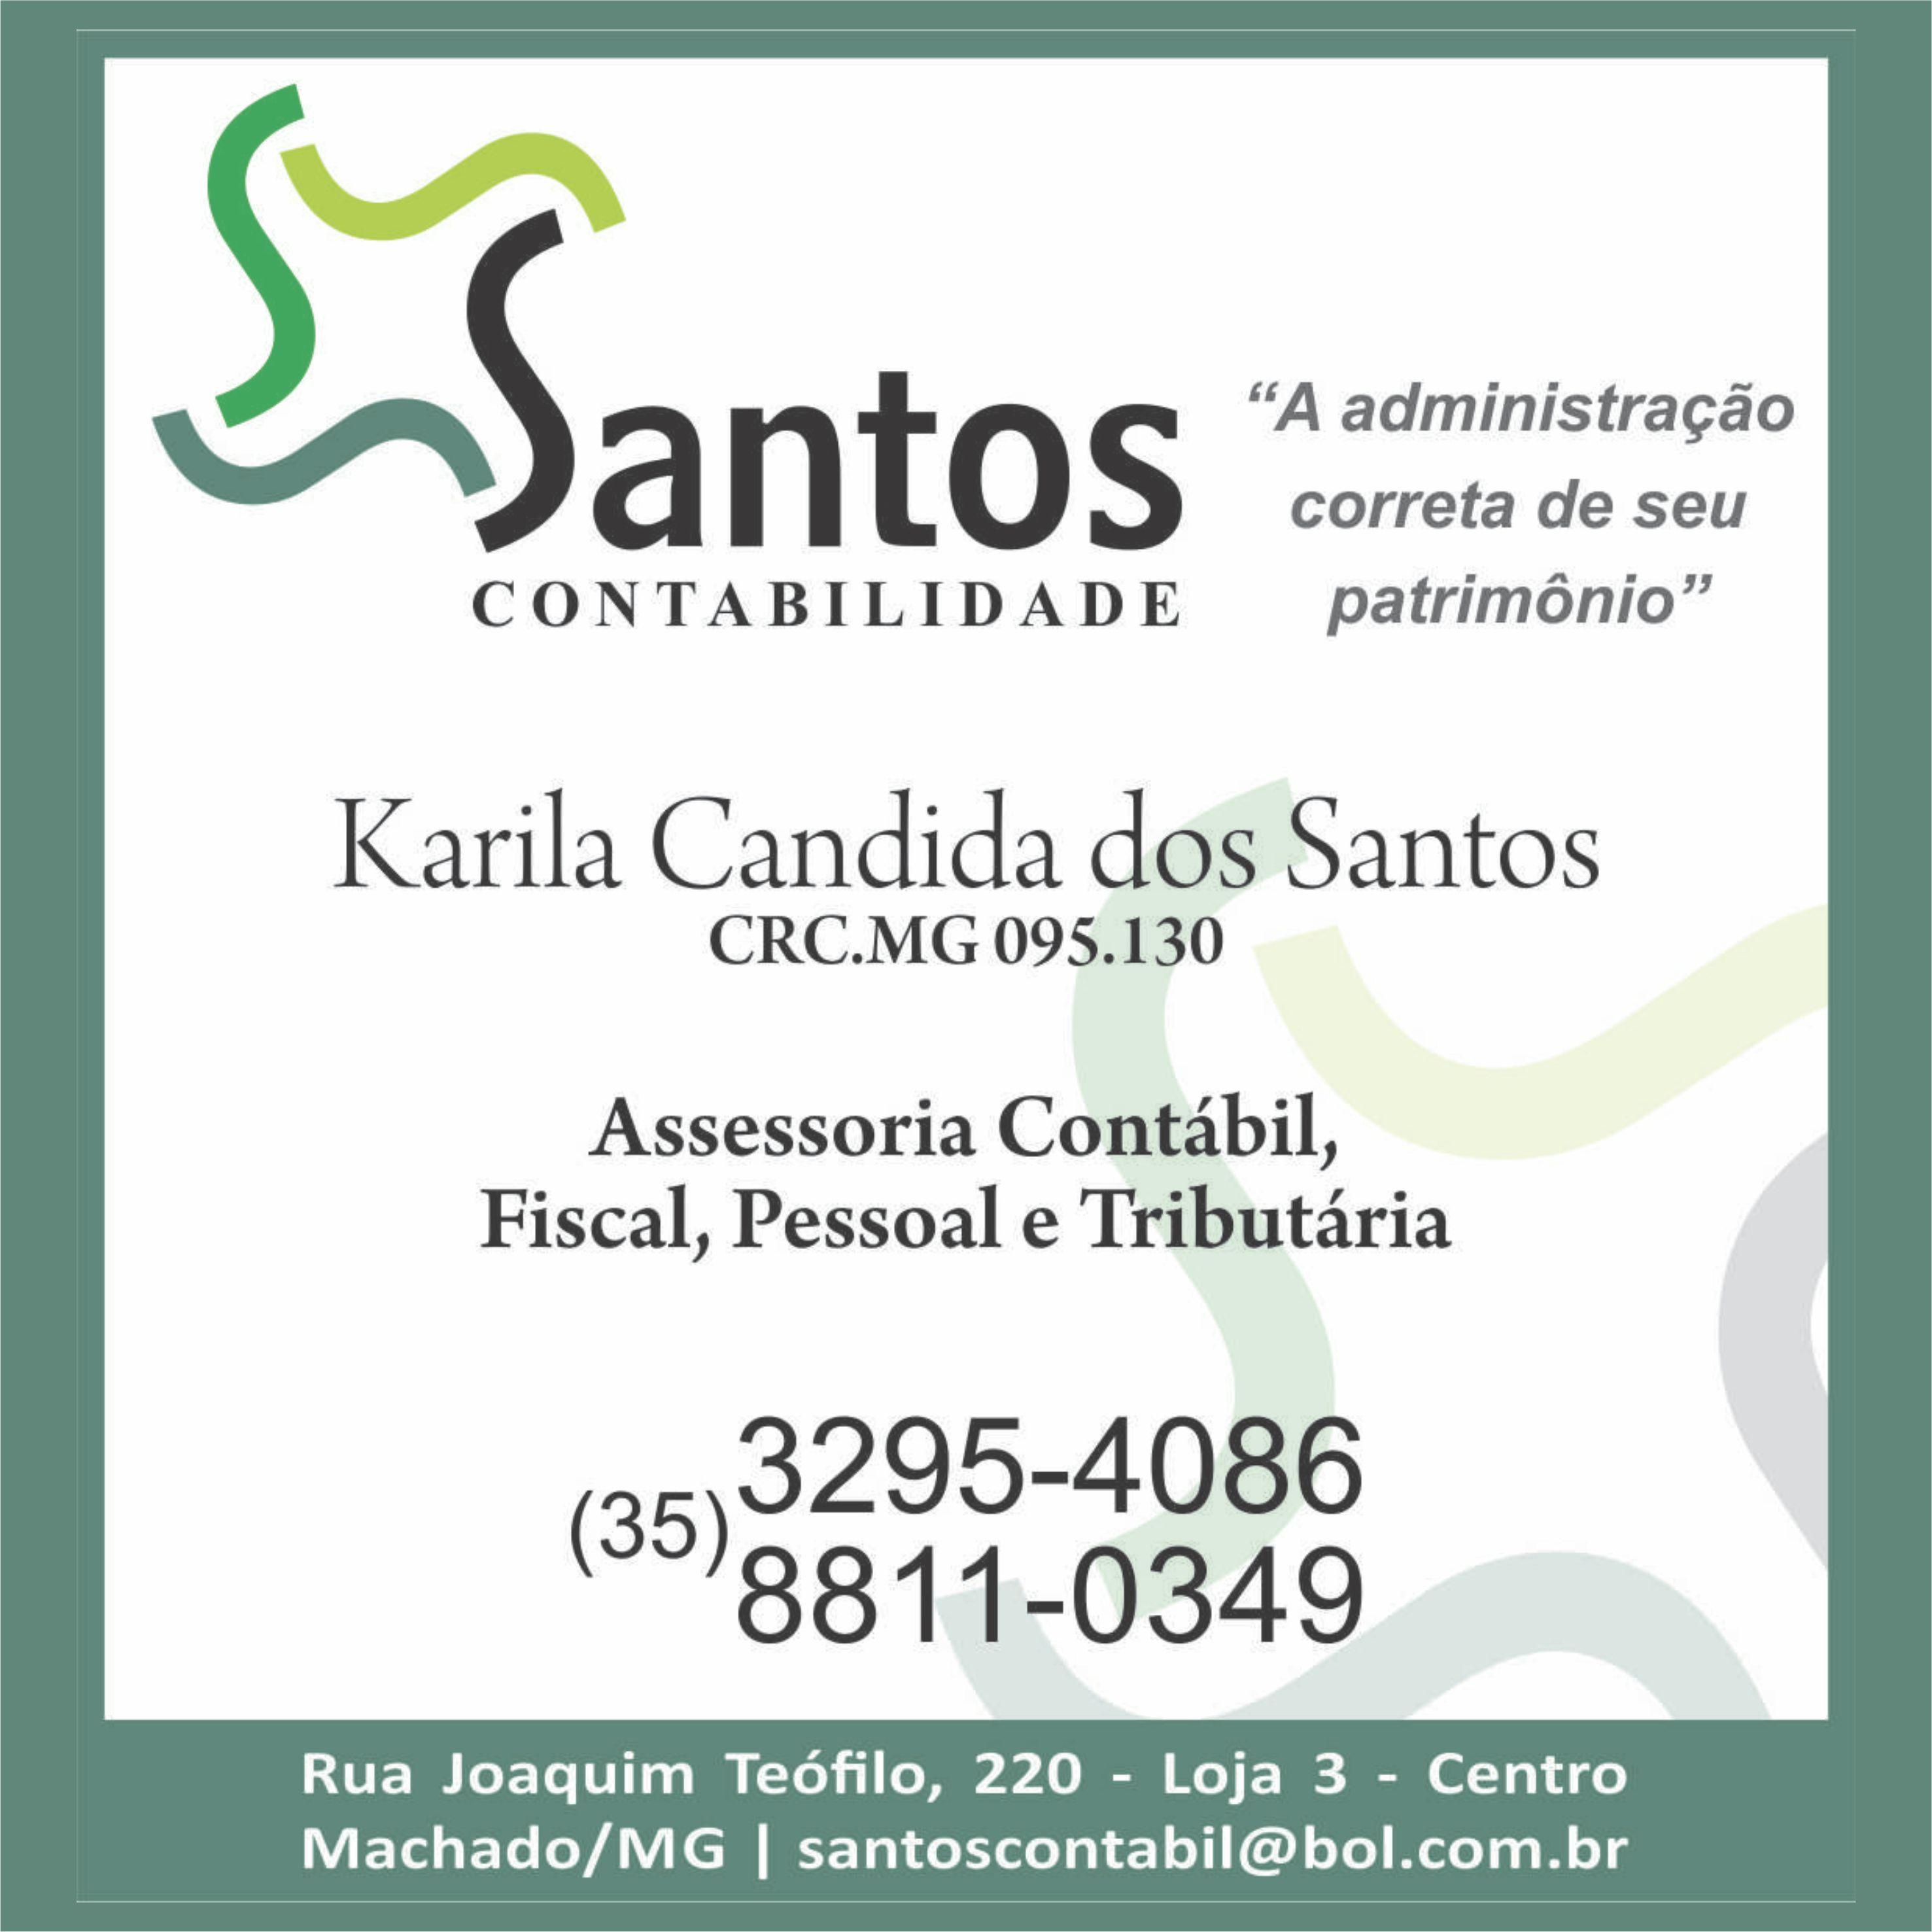 Santos Contabilidade